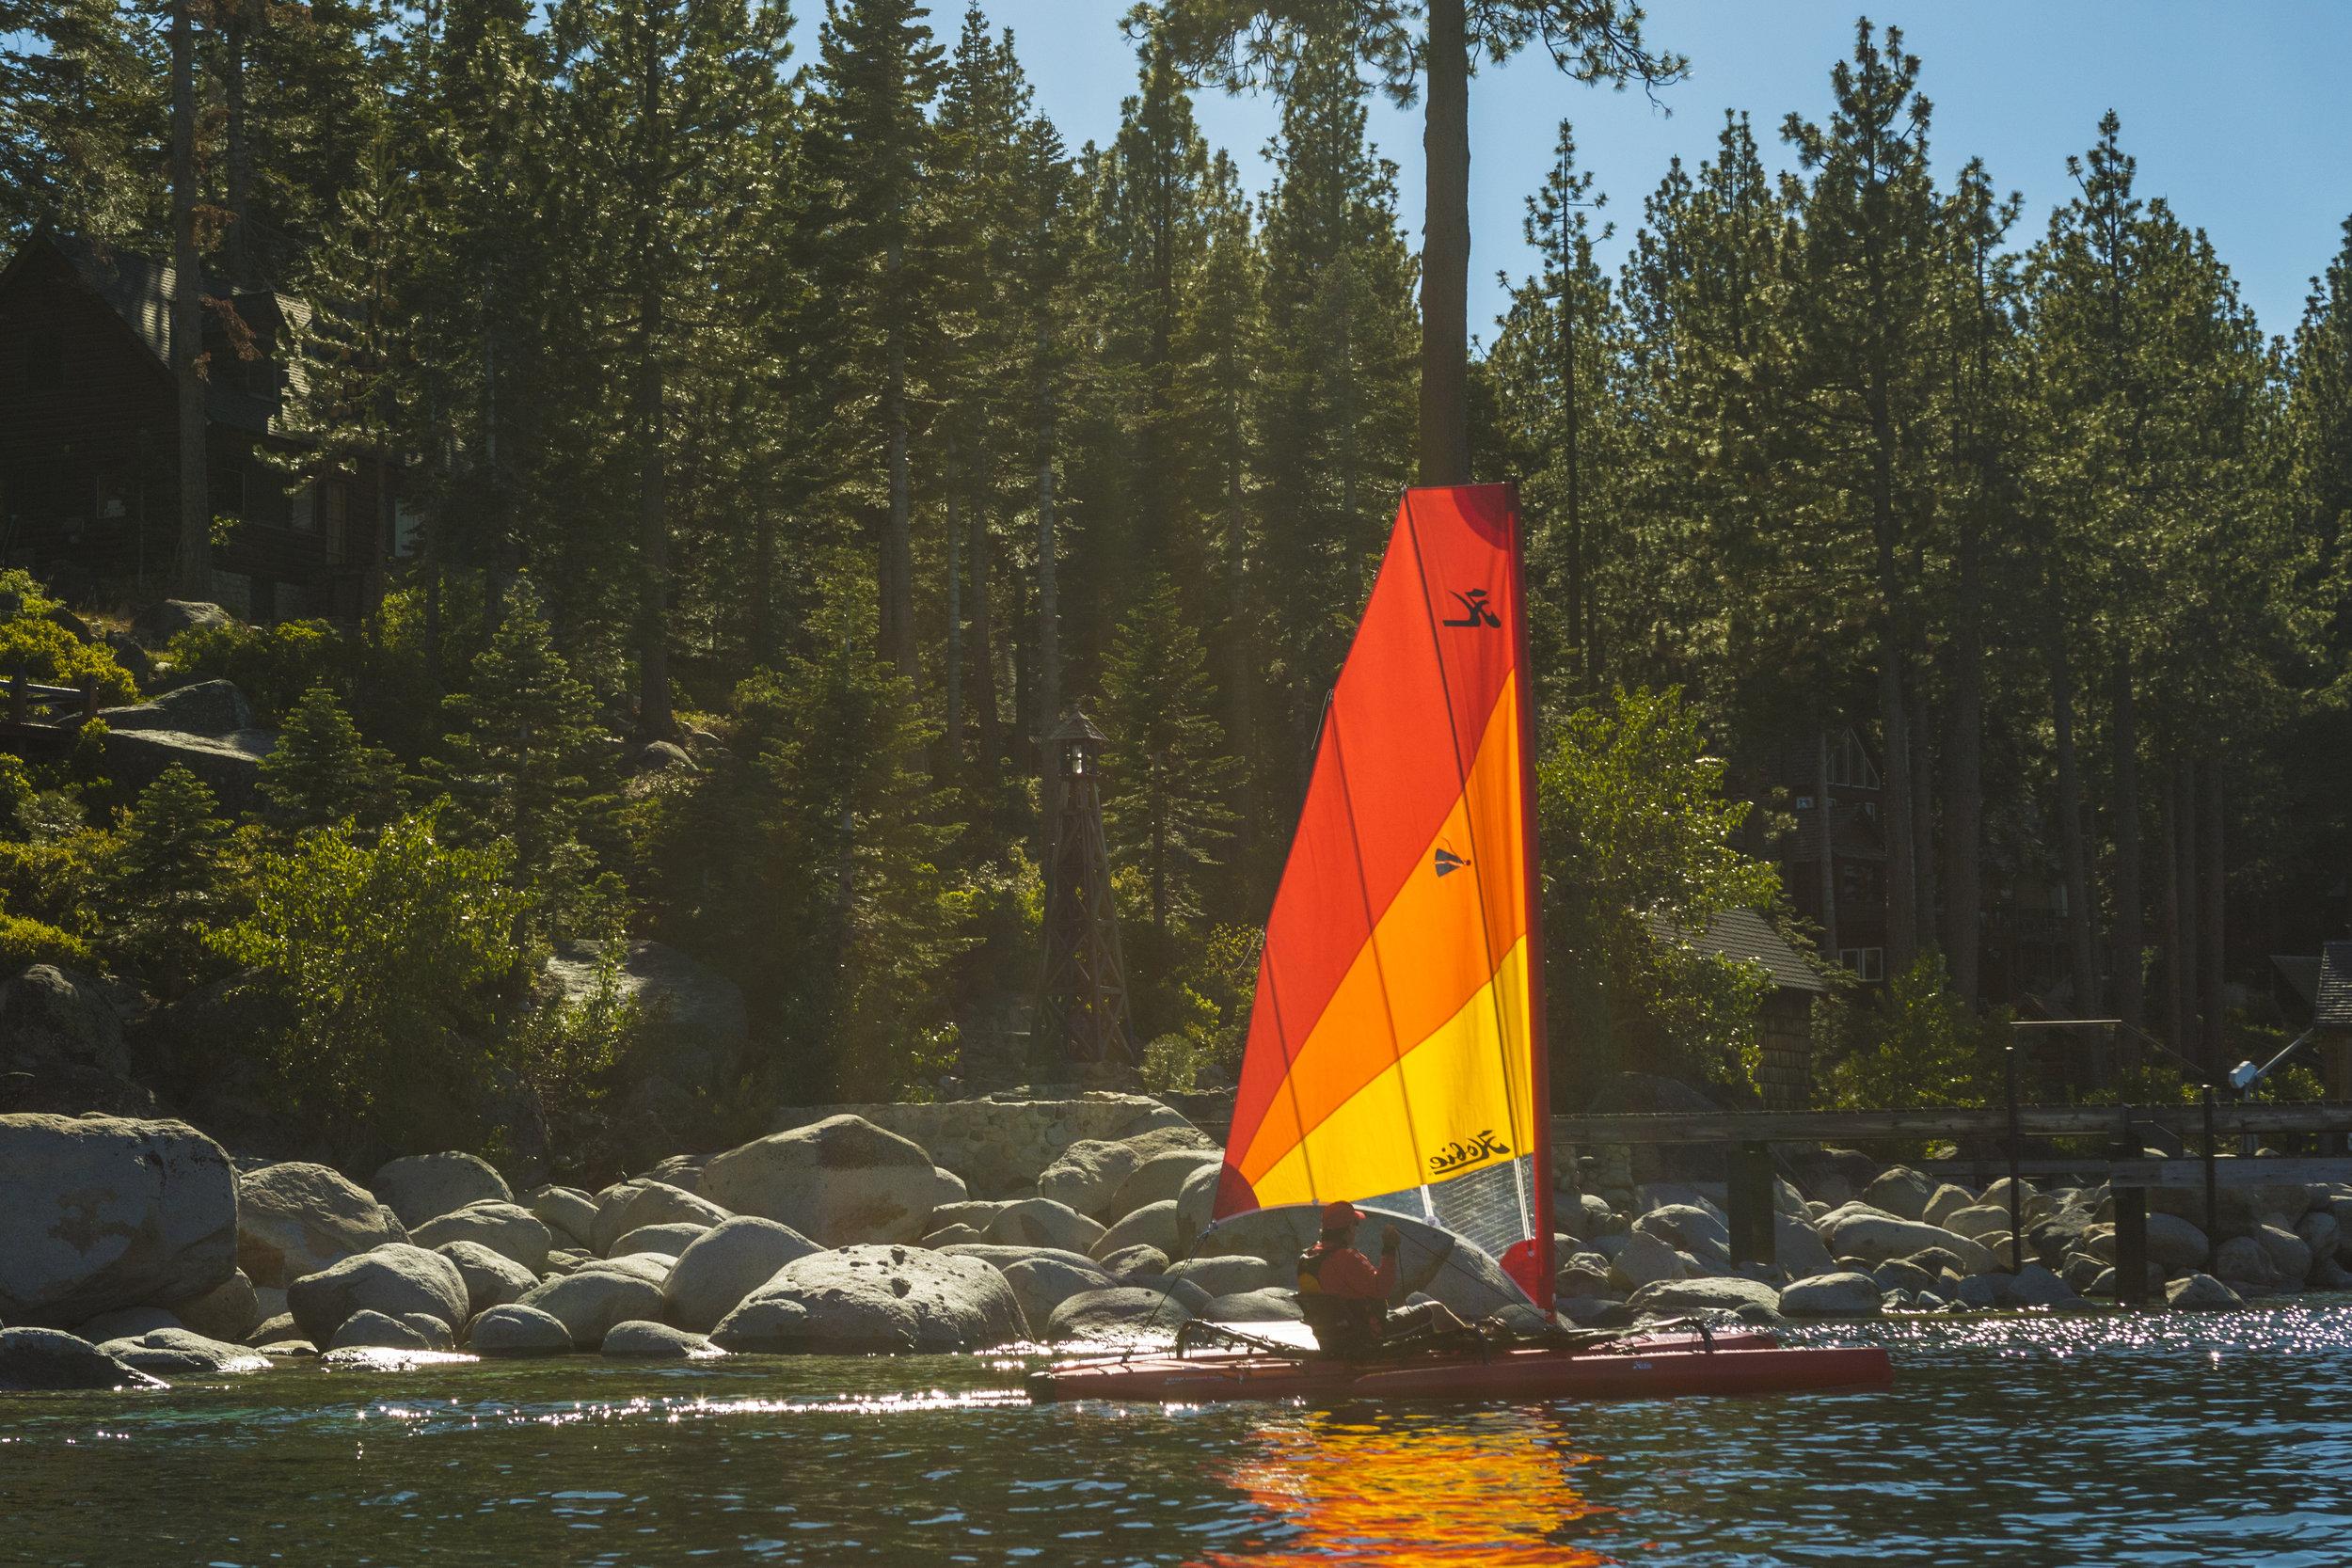 AdventureIsland_action_Tahoe_Red_forest_2809_full.jpg